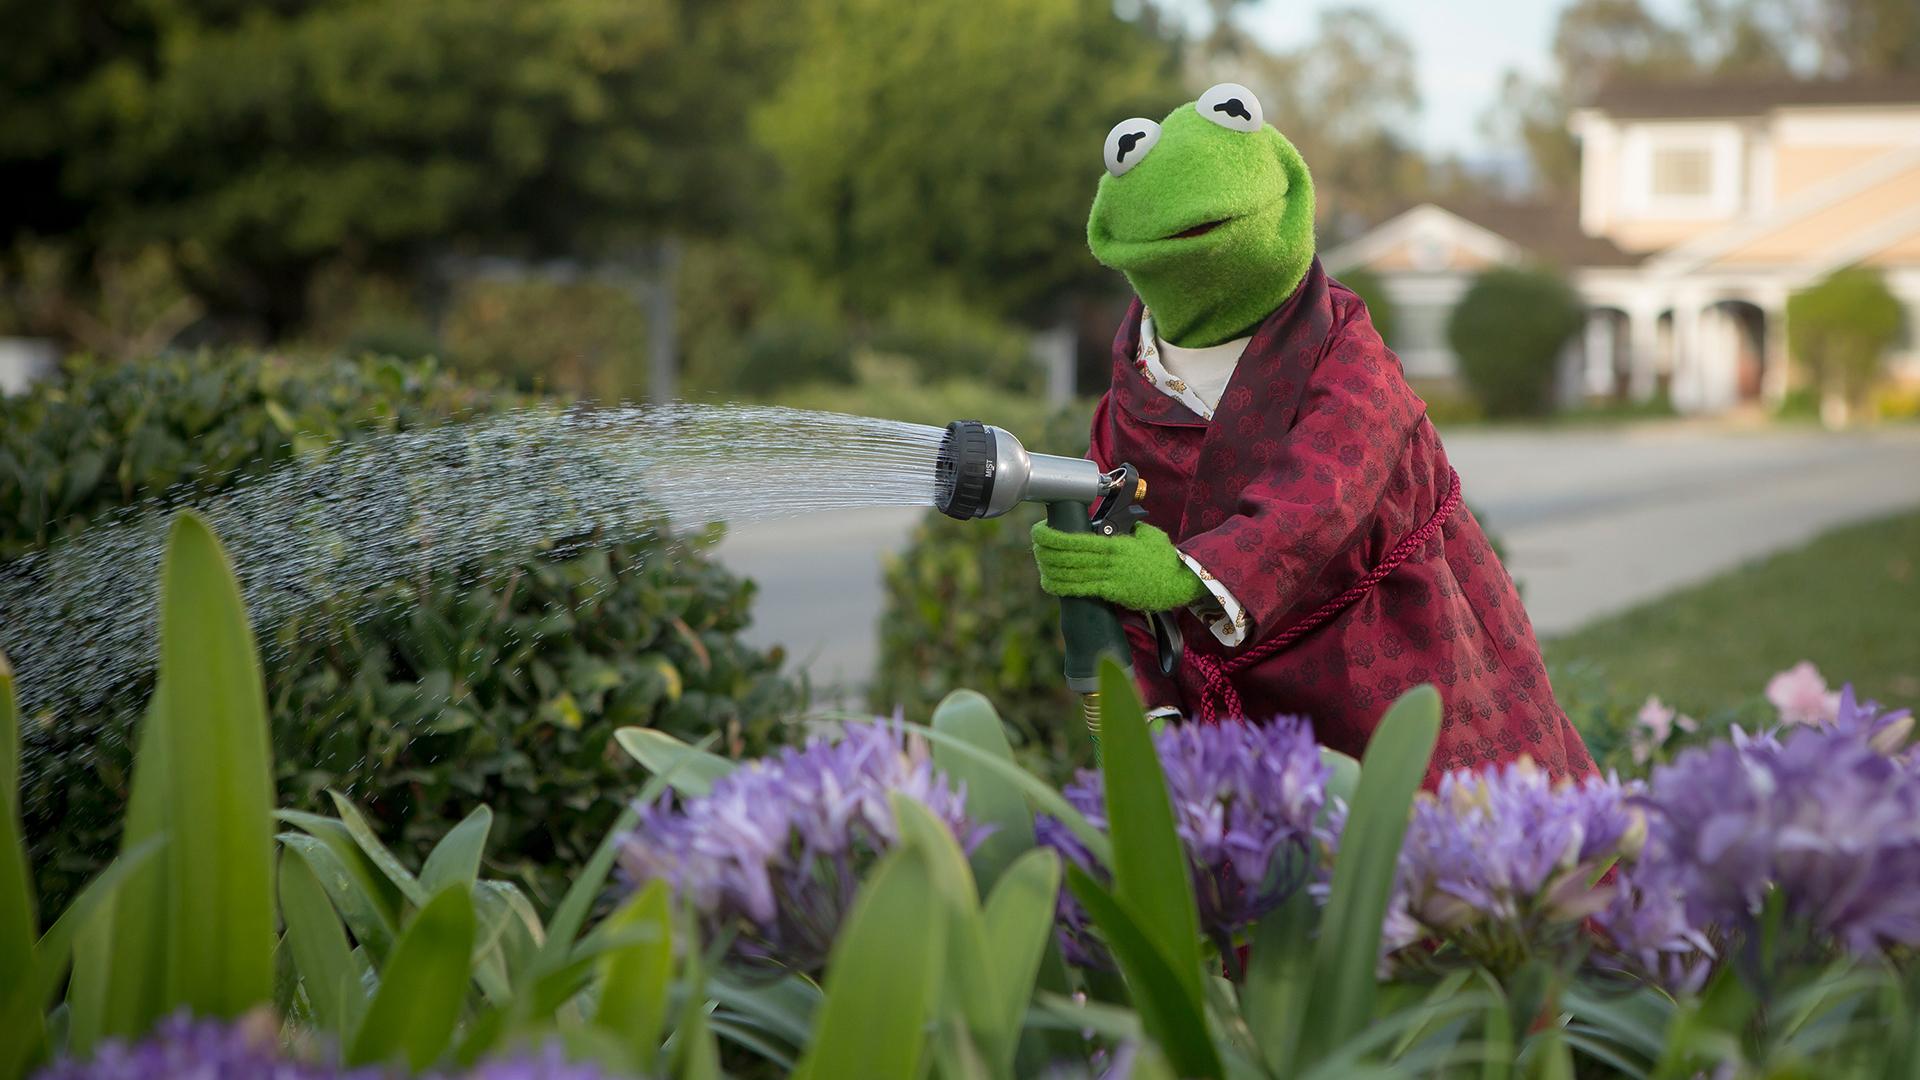 Wallpaper Kermit The Frog Flowers Sesame Street The